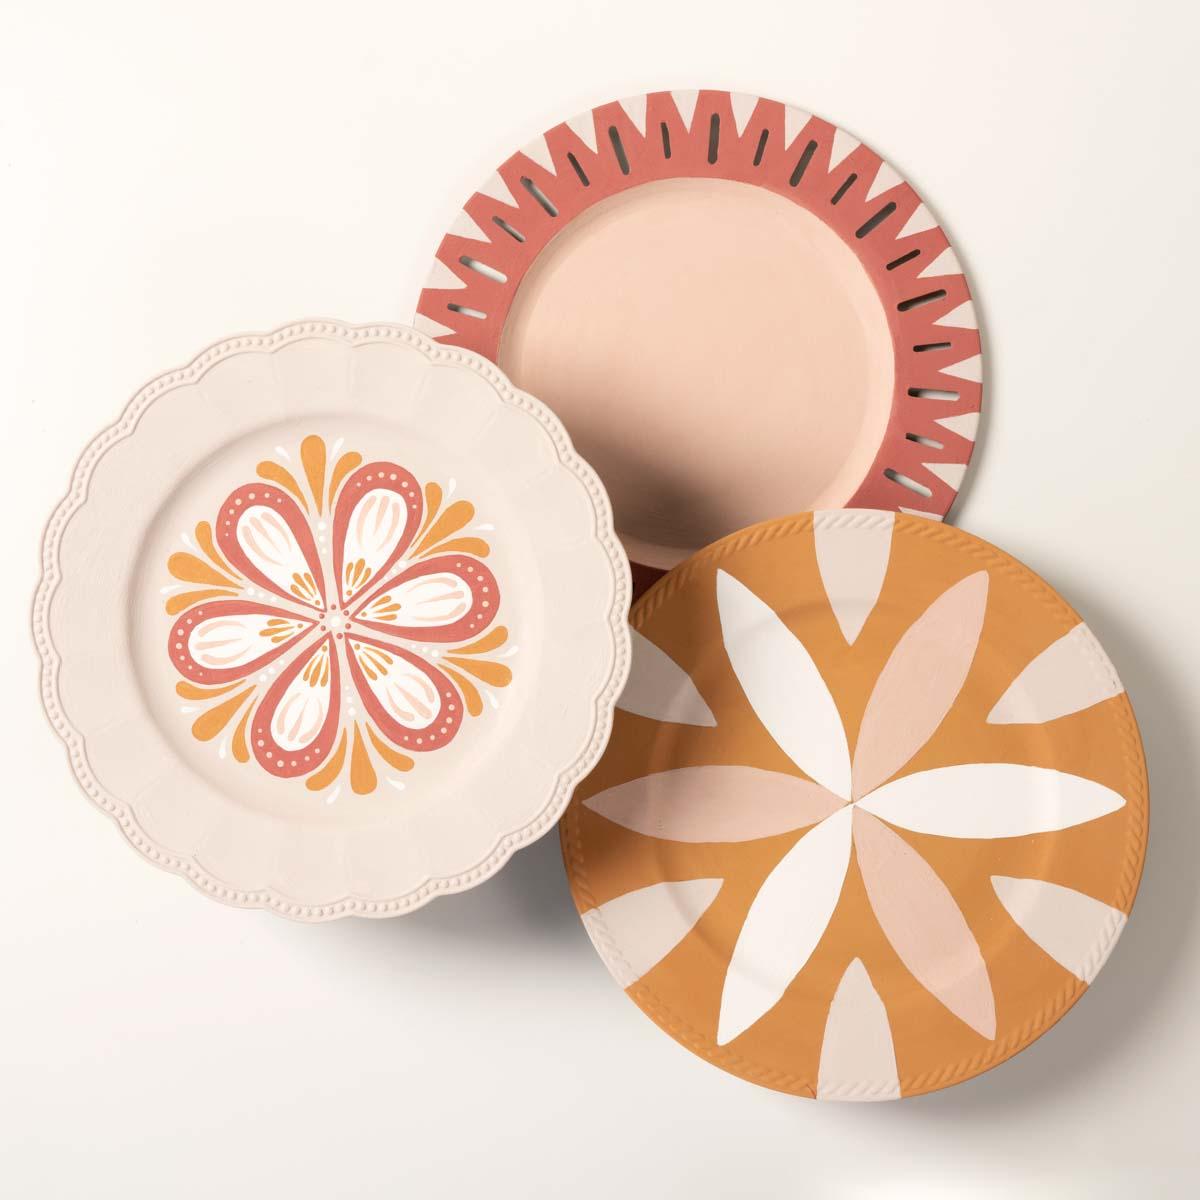 FolkArt ® Terra Cotta™ Acrylic Paint - Earthy Rose, 2 oz. - 7016